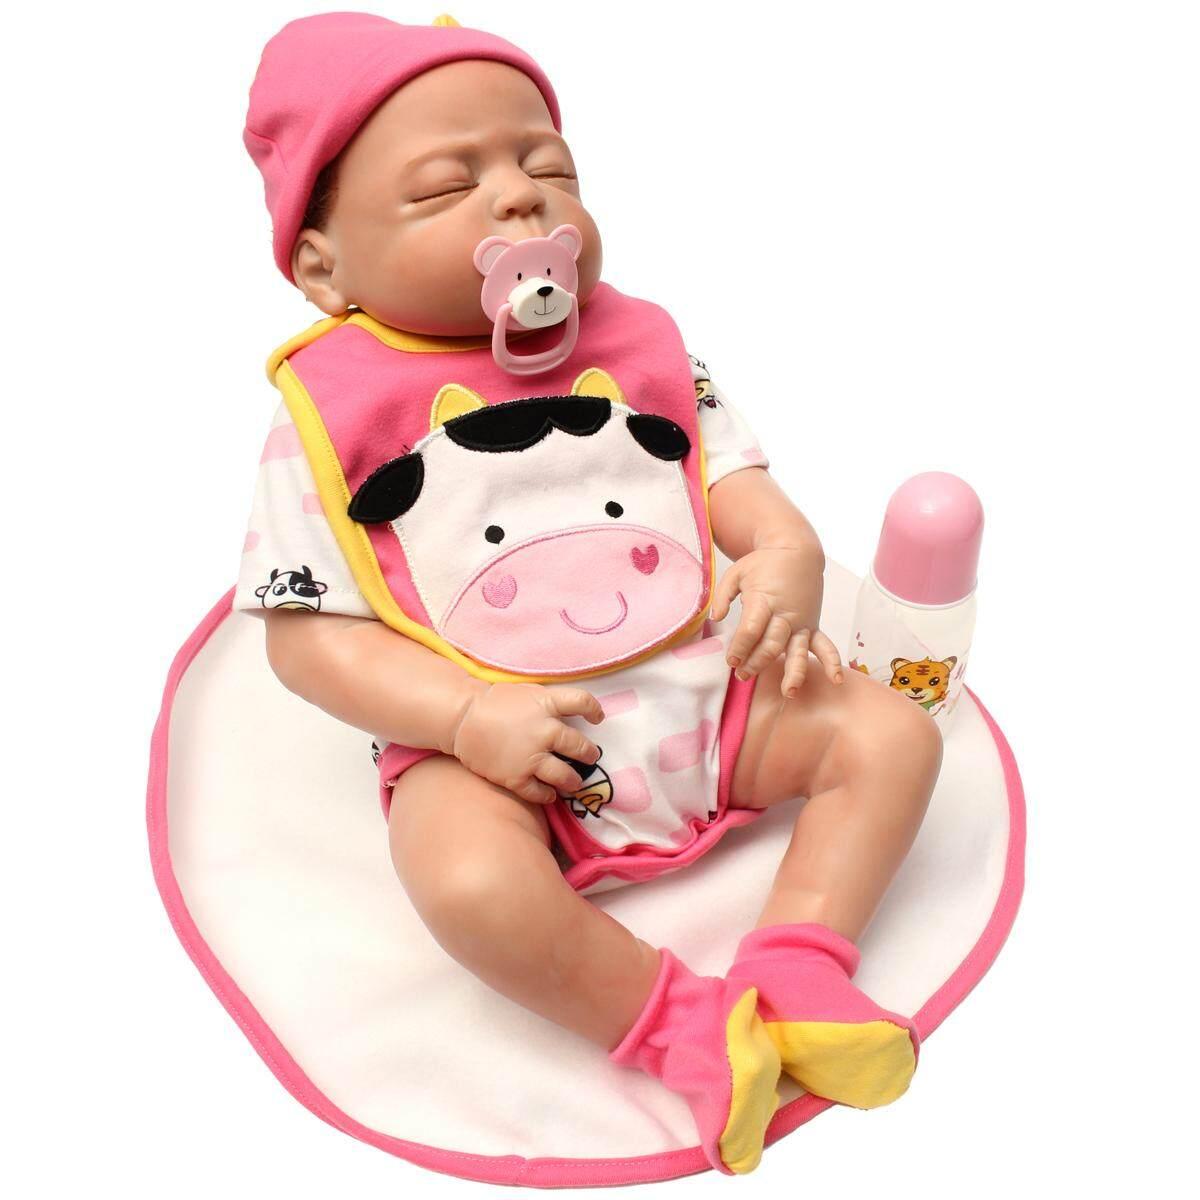 Buy Sell Cheapest Npk Potensol Ultra Best Quality Product Deals Pupuk Nutrisi Growmore Bunga Dan Buah 6 30 454gram 23 Inch 58cm Reborn Baby Soft Silicone Doll Sleeping Handmade Lifelike Girl Dolls